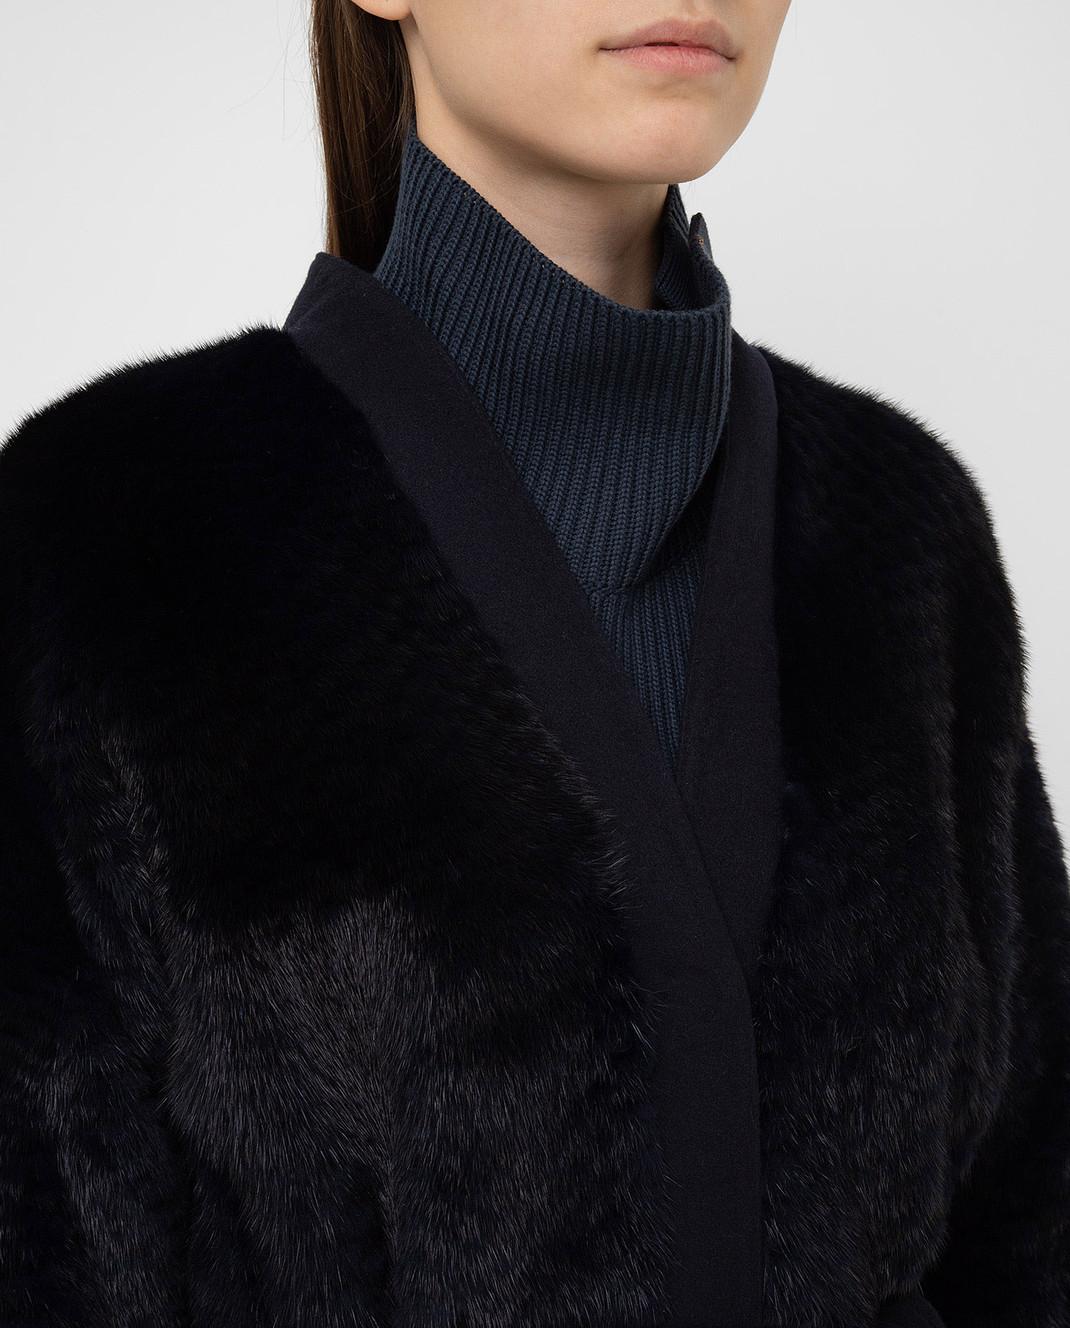 Giuliana Teso Темно-синяя шуба из норки 84KA062 изображение 5